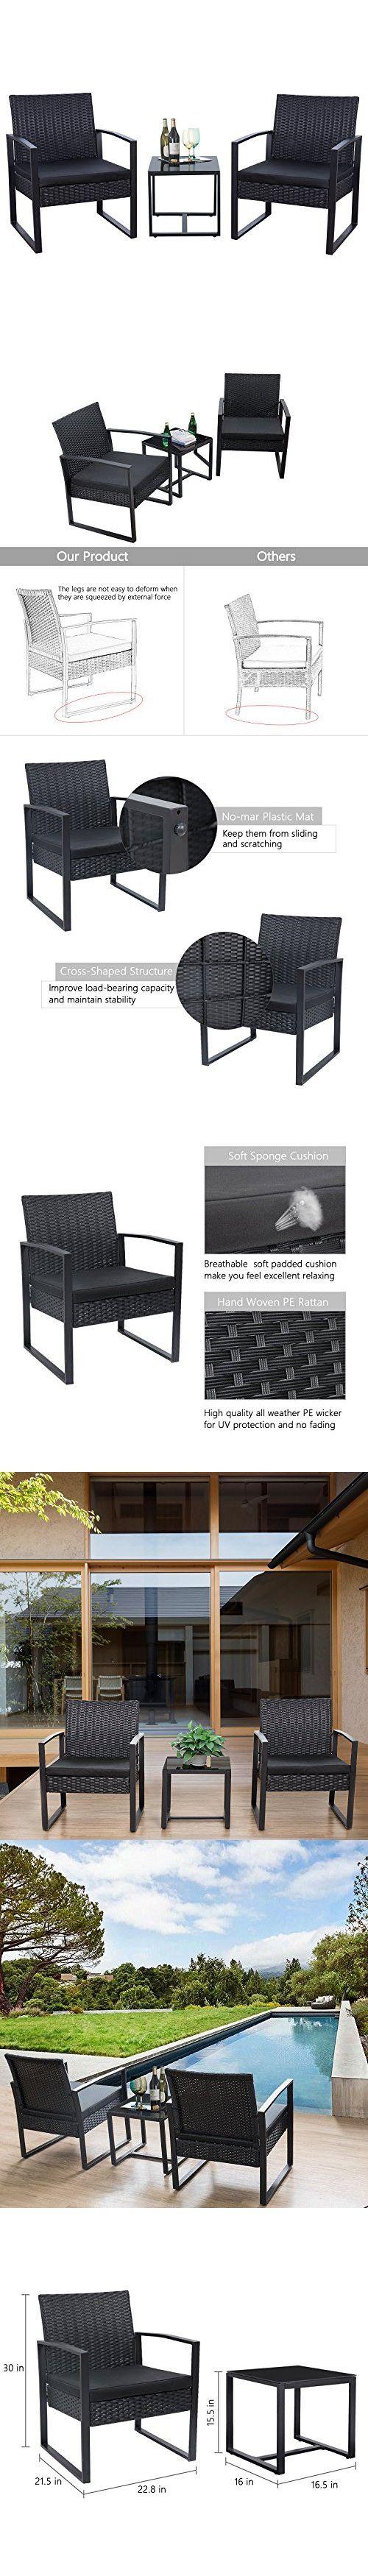 Best Flamaker 3 Pieces Patio Furniture Set Modern Outdoor 400 x 300